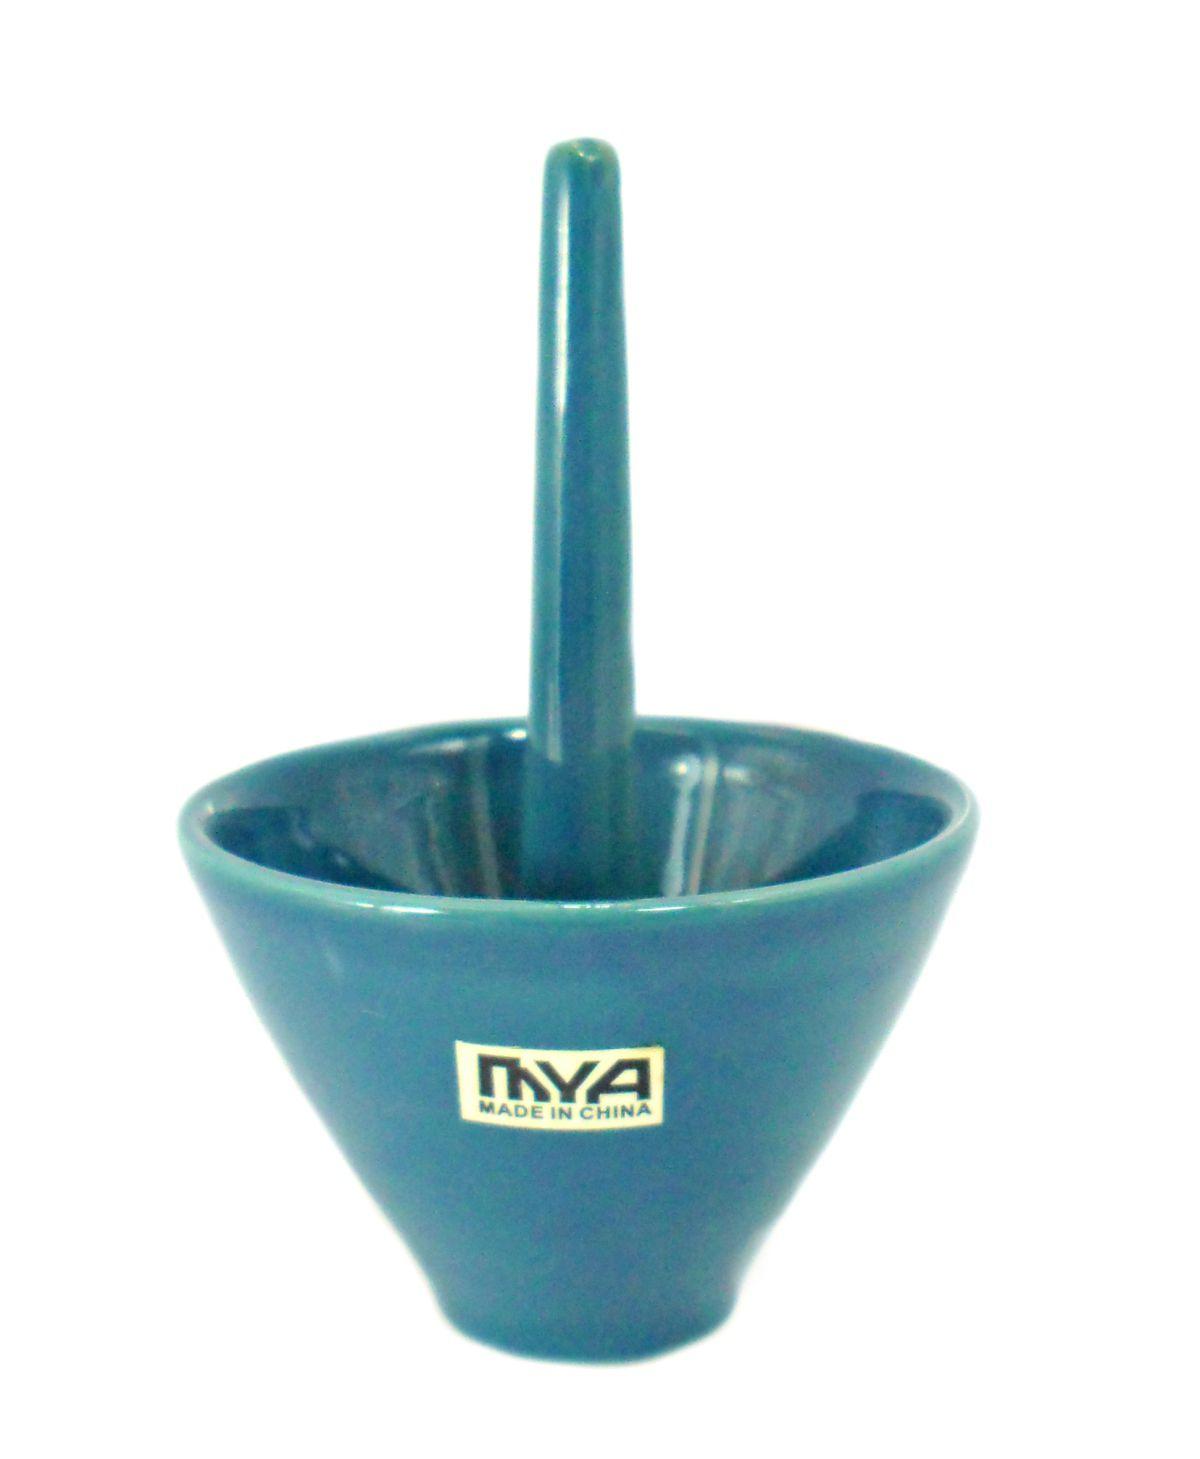 Fornilho/Rosh para narguile Mya Mozza. 9,0cm alt., 6,6cm diâm. Azul Claro